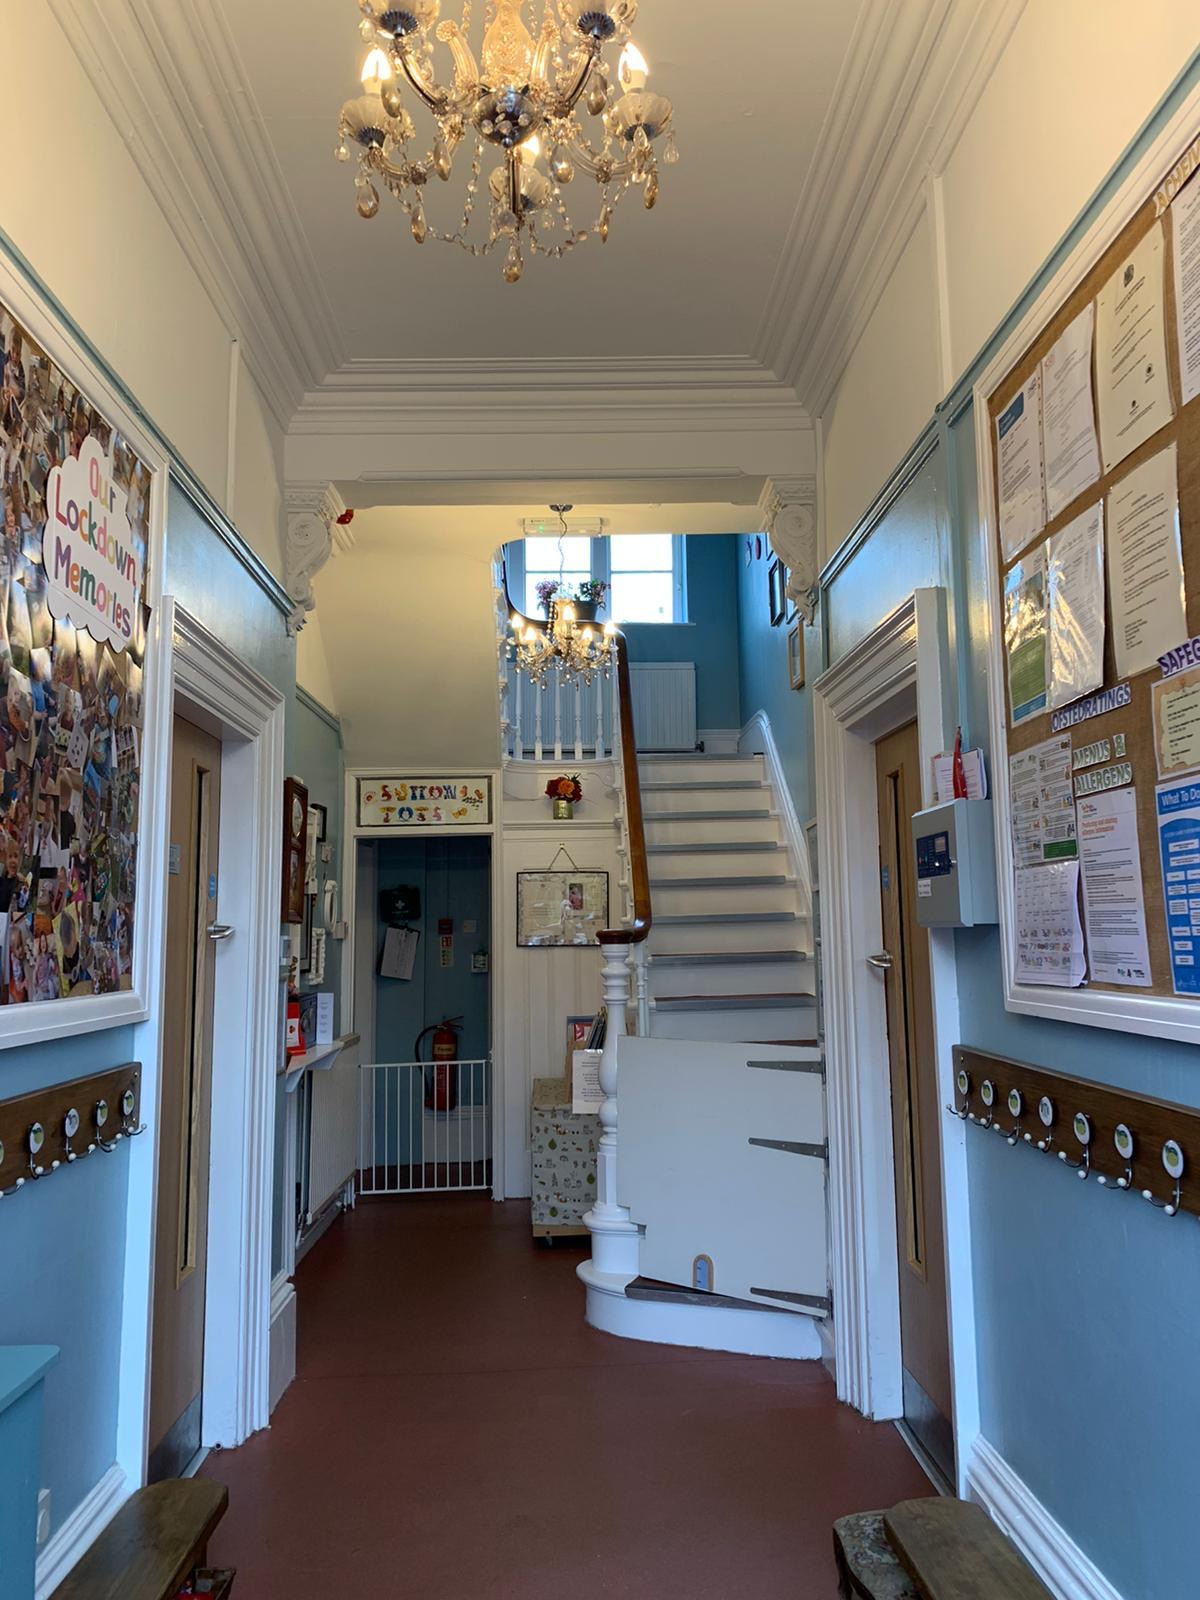 Our Hallway!